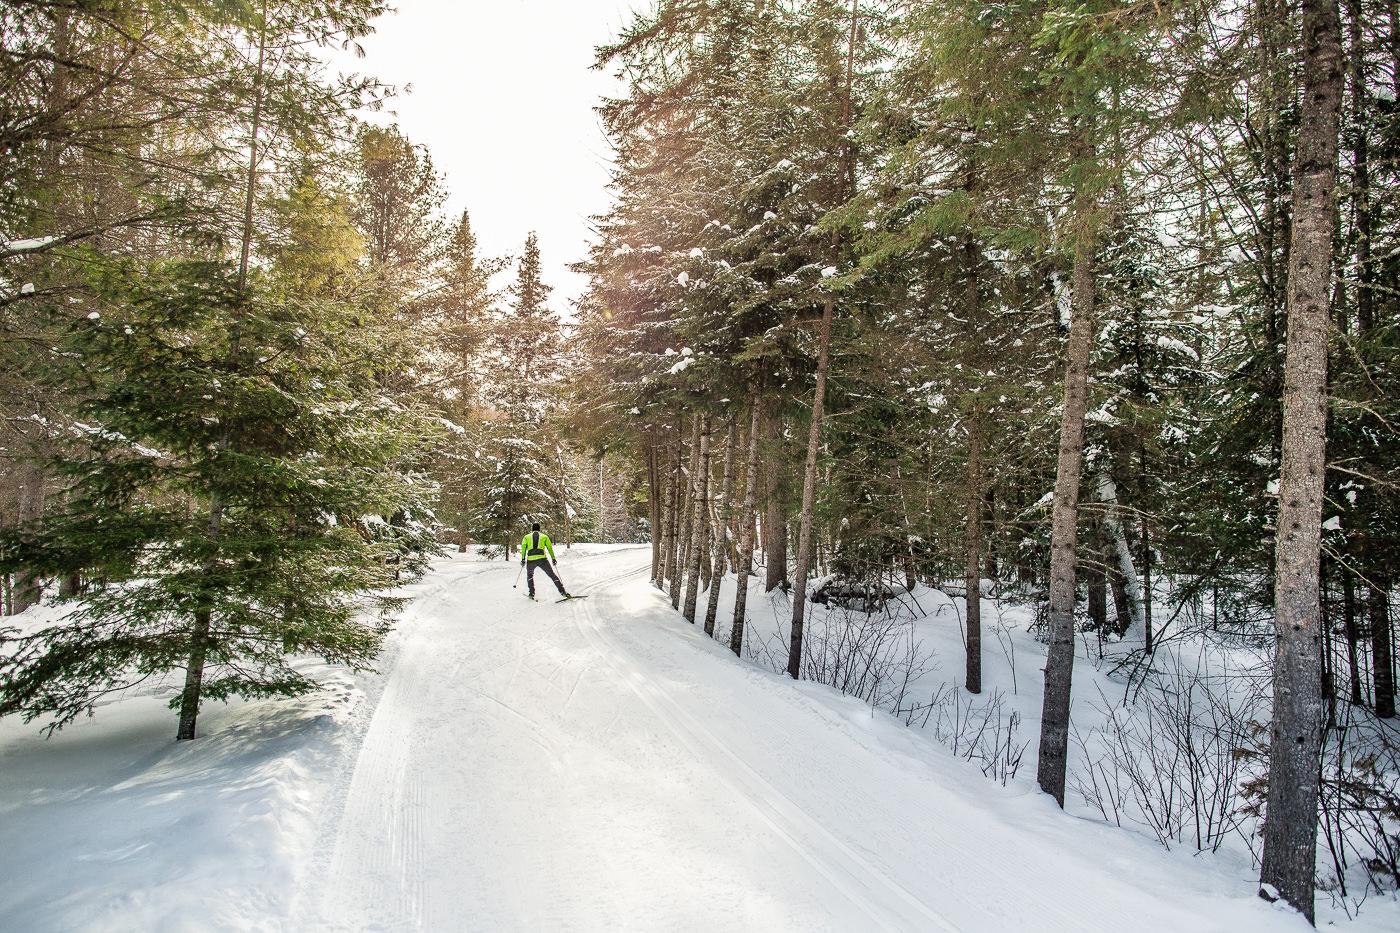 photo commercial ski de fond swix canada performance foret hiver